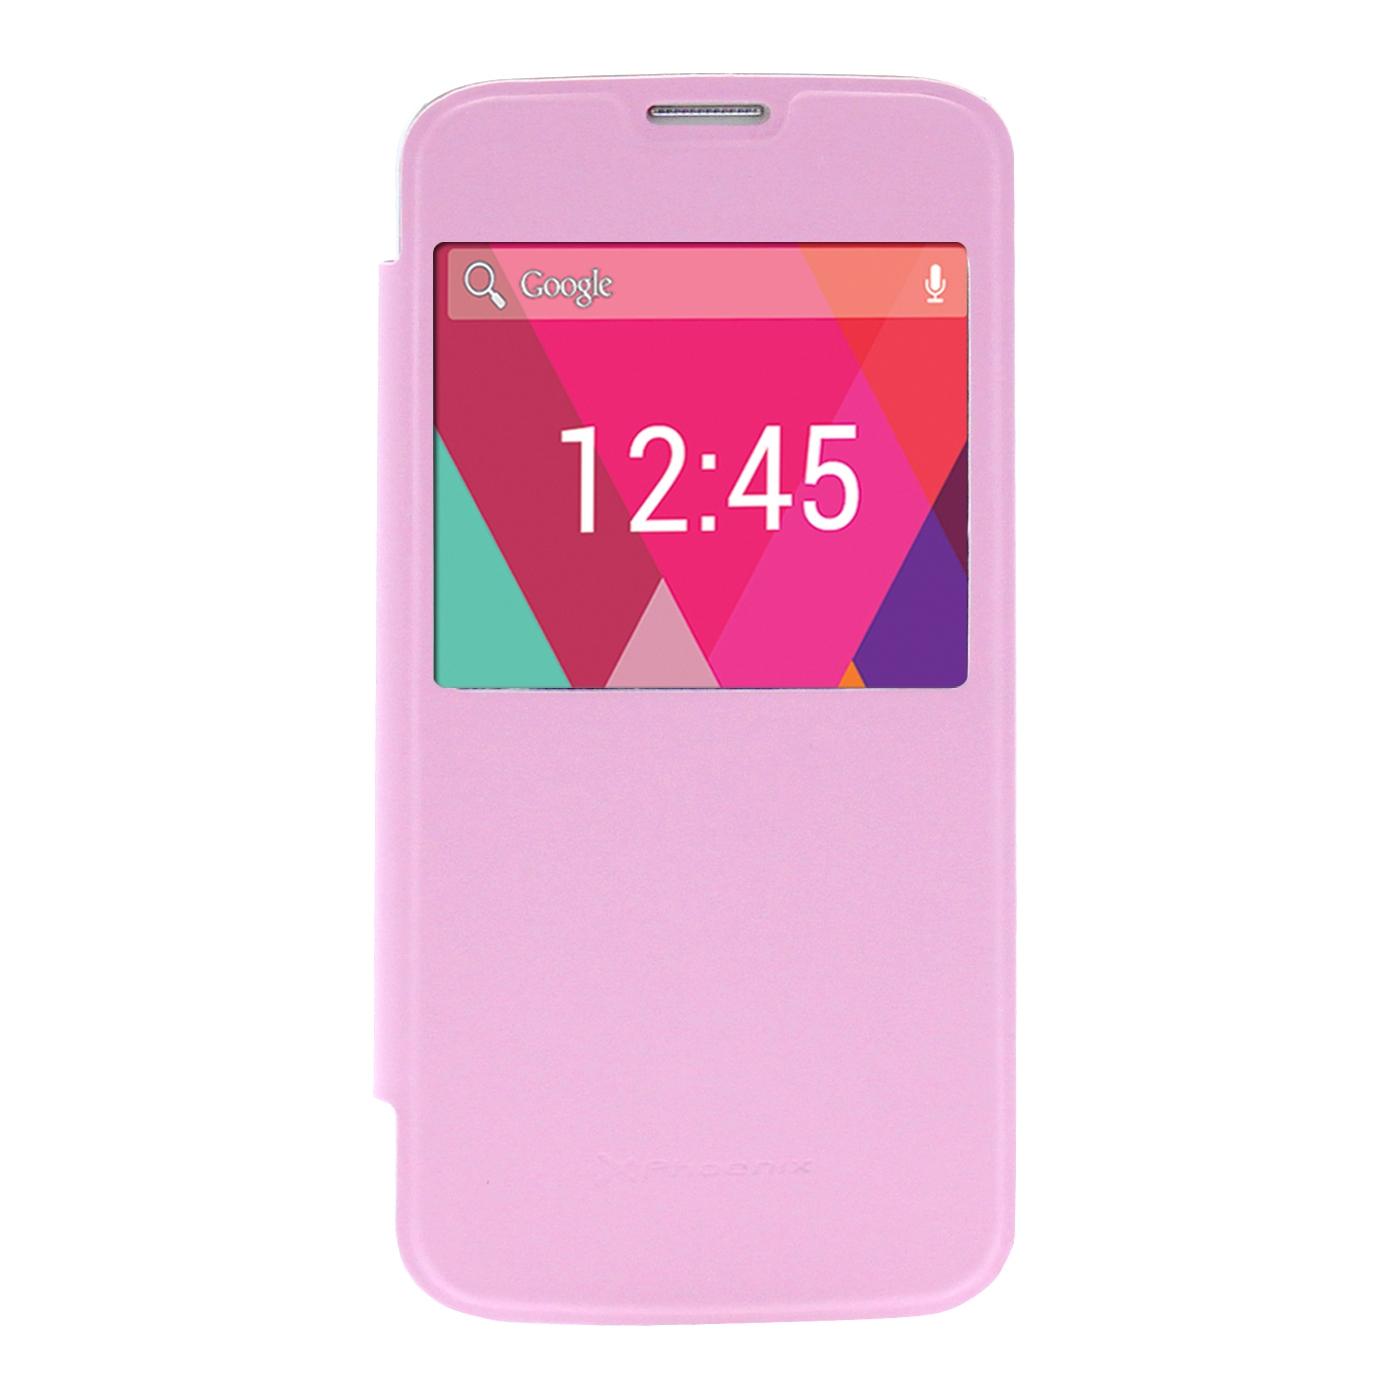 Funda Slim Cover Case  Phoenix Para Telefono Smartphone  Phrockx1 5 Pulgadas Rosa PHROCKX1SLIMCASEP